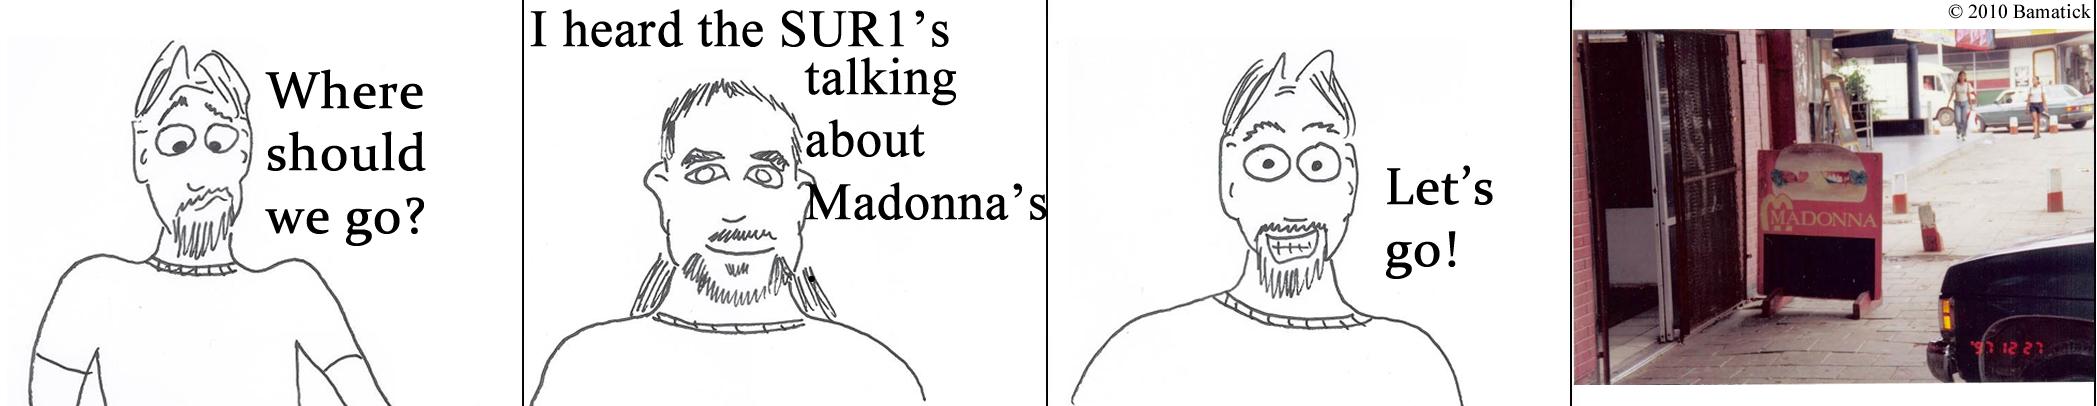 comic-2010-07-14-Madonnas.jpg